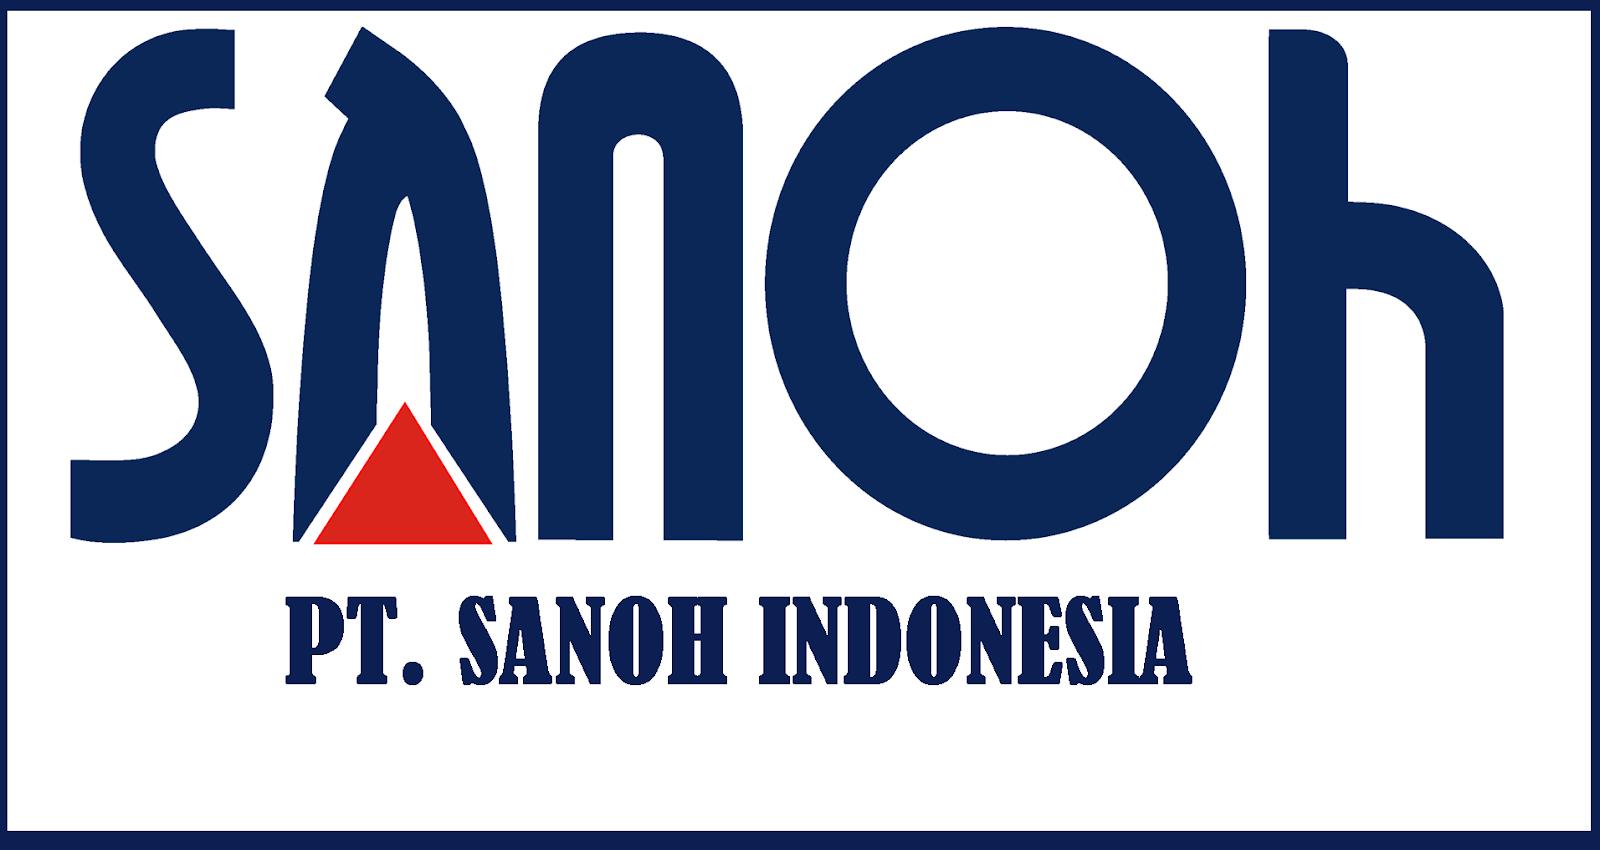 Loker SMK Via Pos Cikarang PT.SANOH INDONESIA Kawasan Hyundai